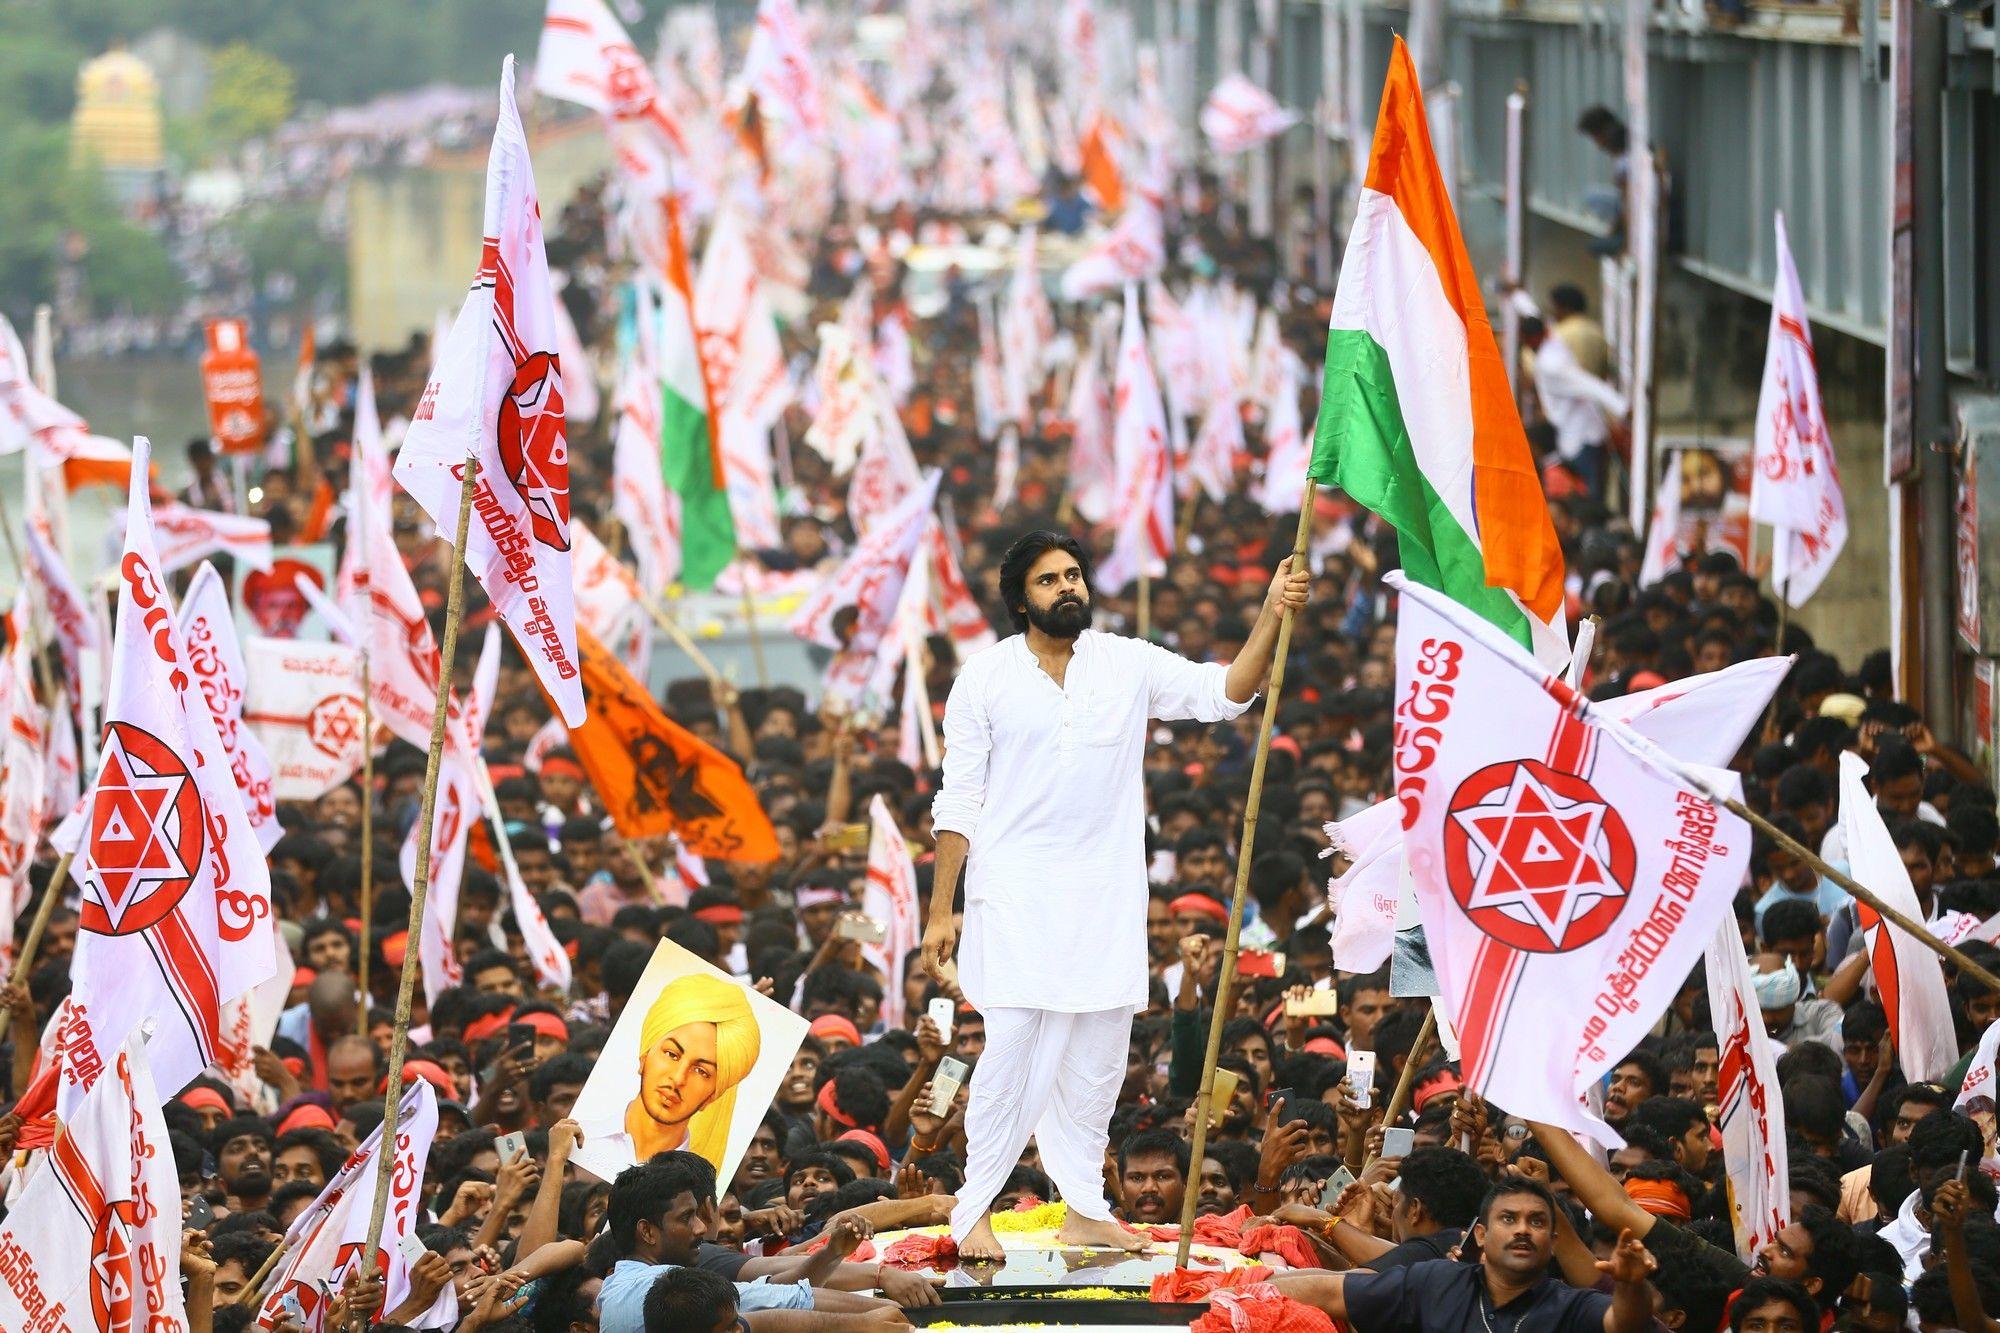 Pawan Kalyan Jana Sena Parade Lakhs of people March to Raise political Awareness